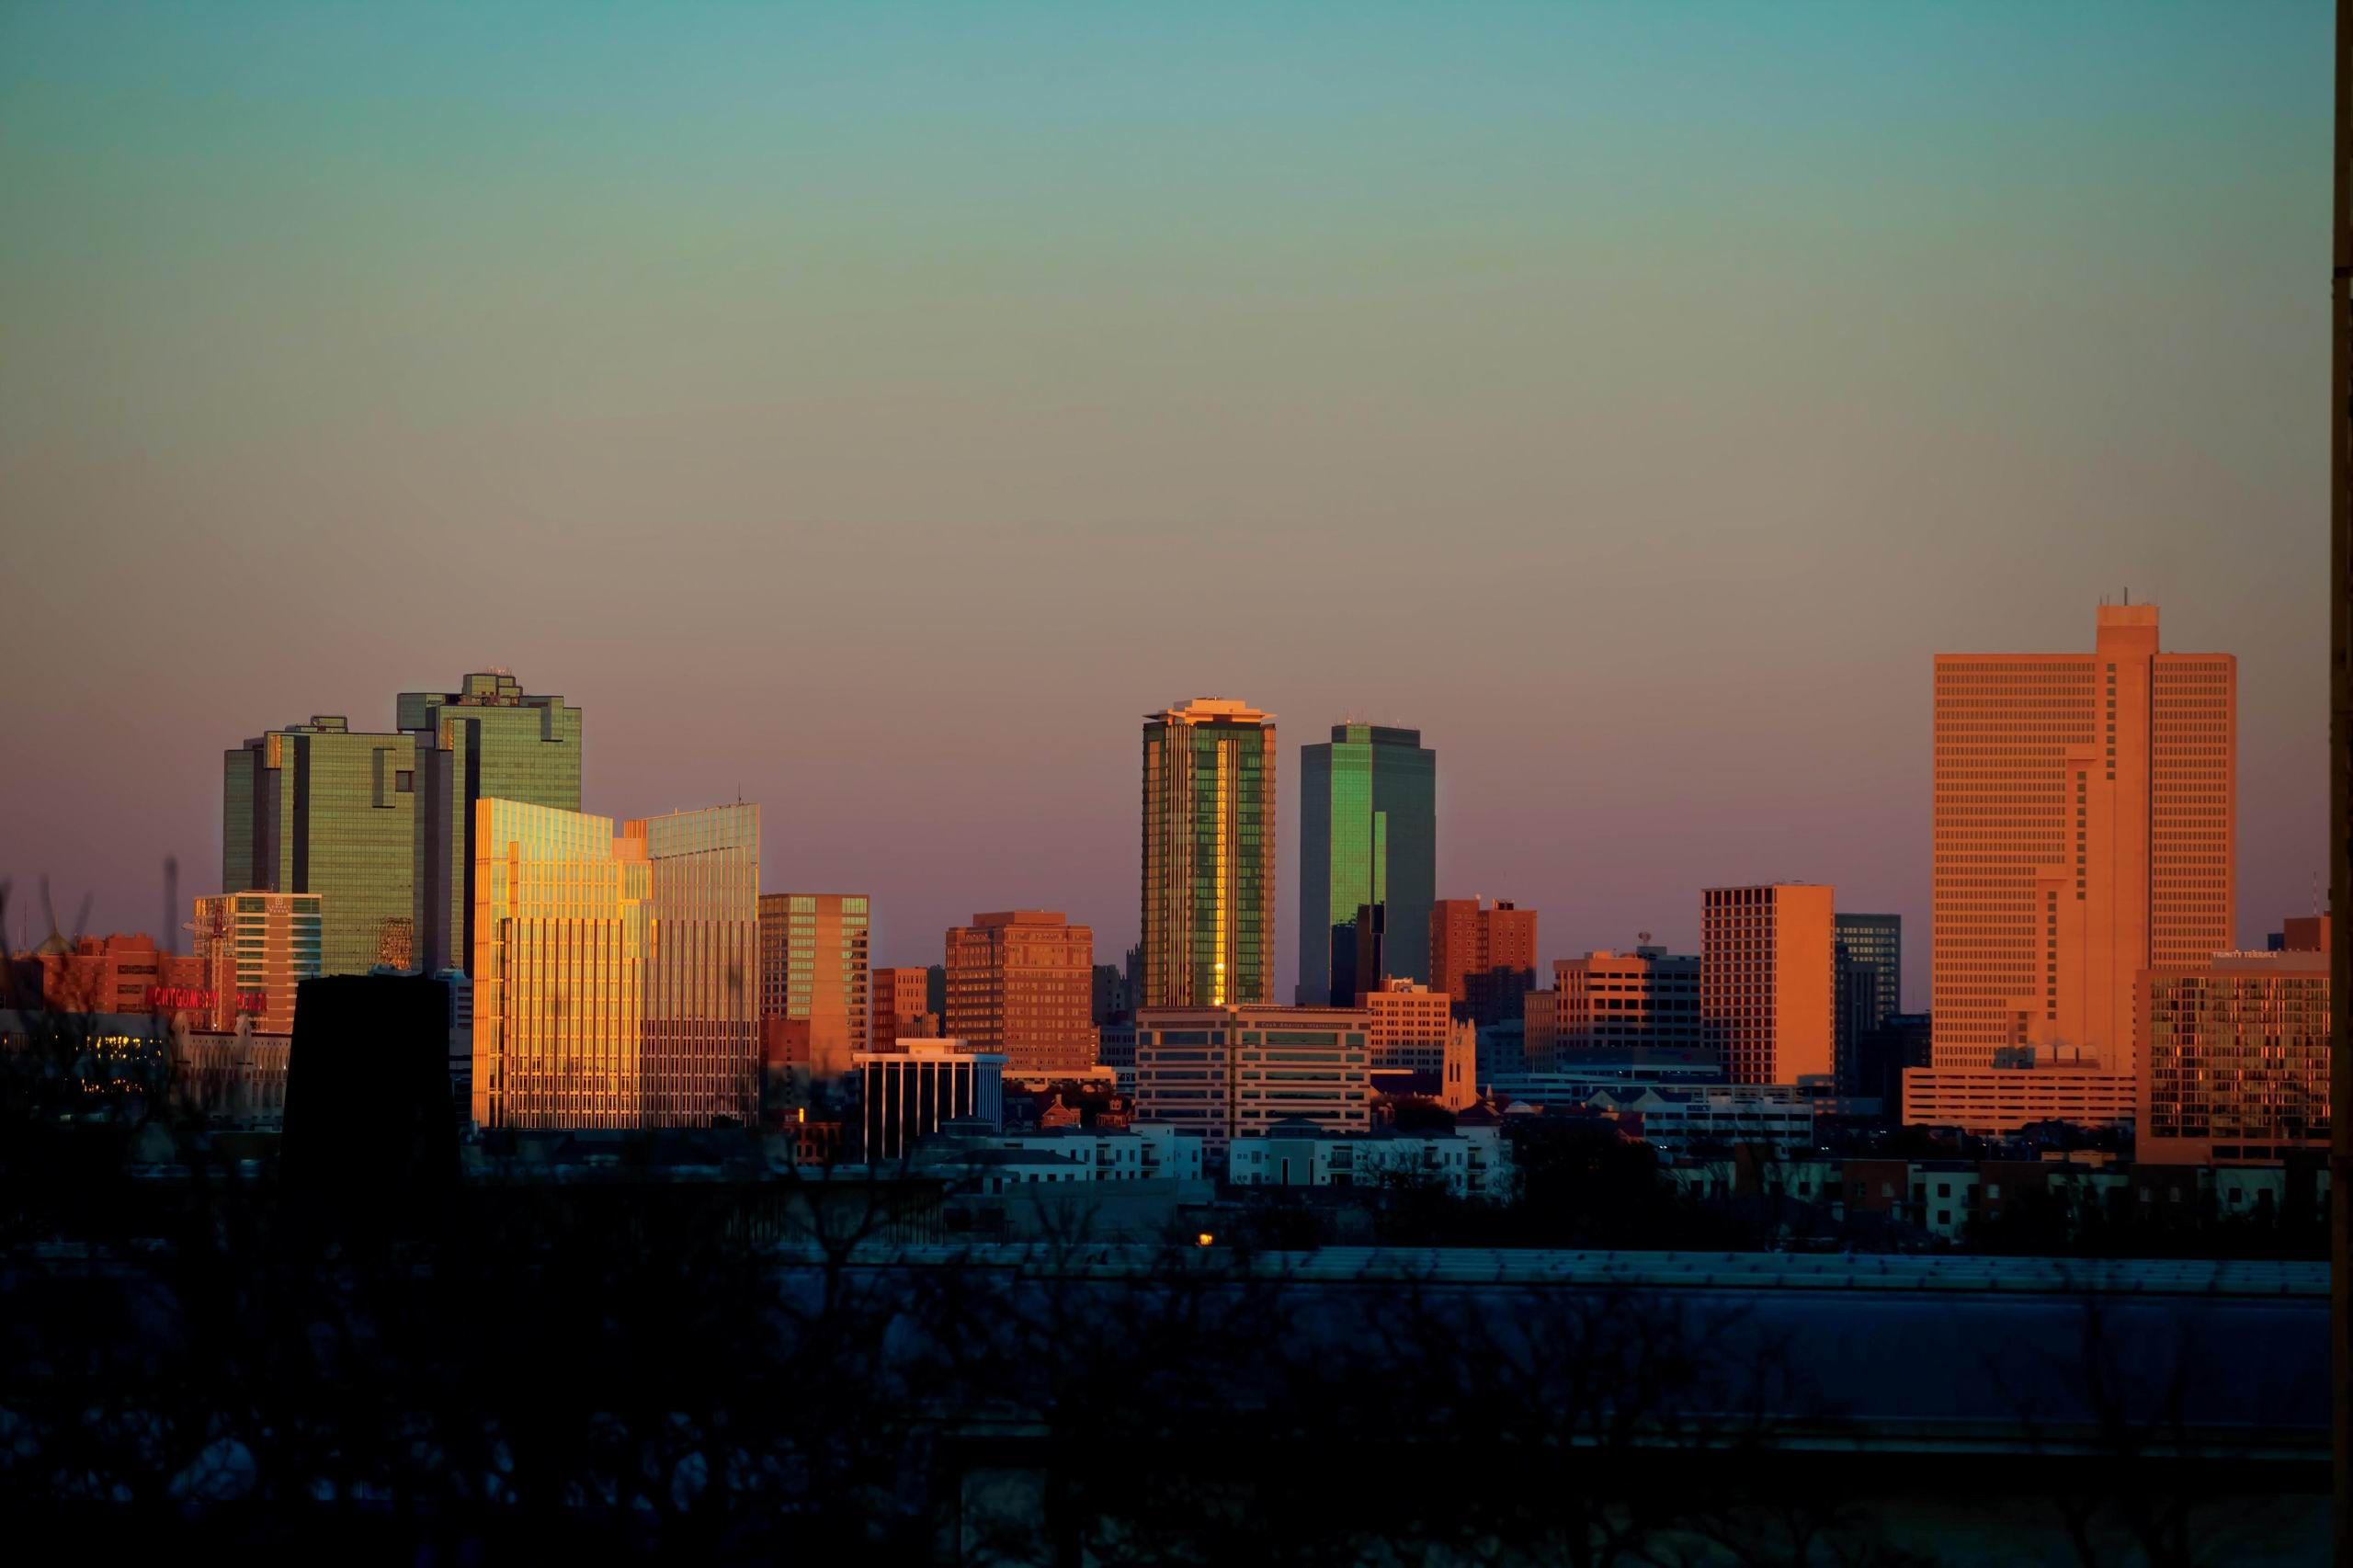 Fort Worth skyline | Skylines | Pinterest | Fort worth ...